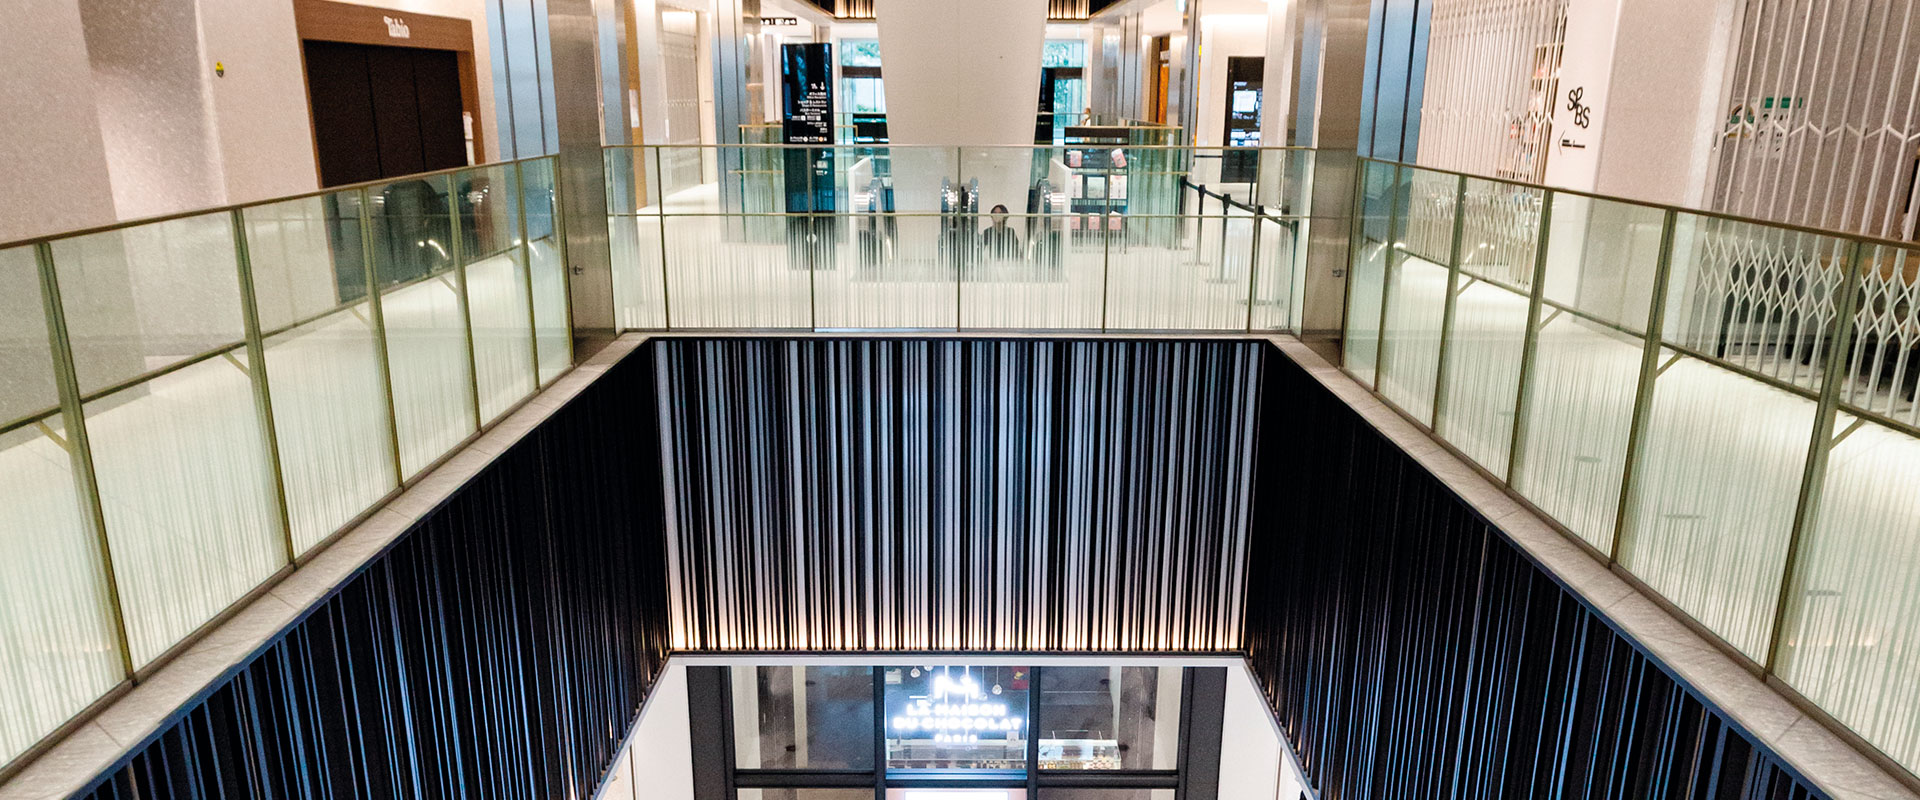 AGGLOTECH-progetto-Toranomon-Business-Tower-slider-4